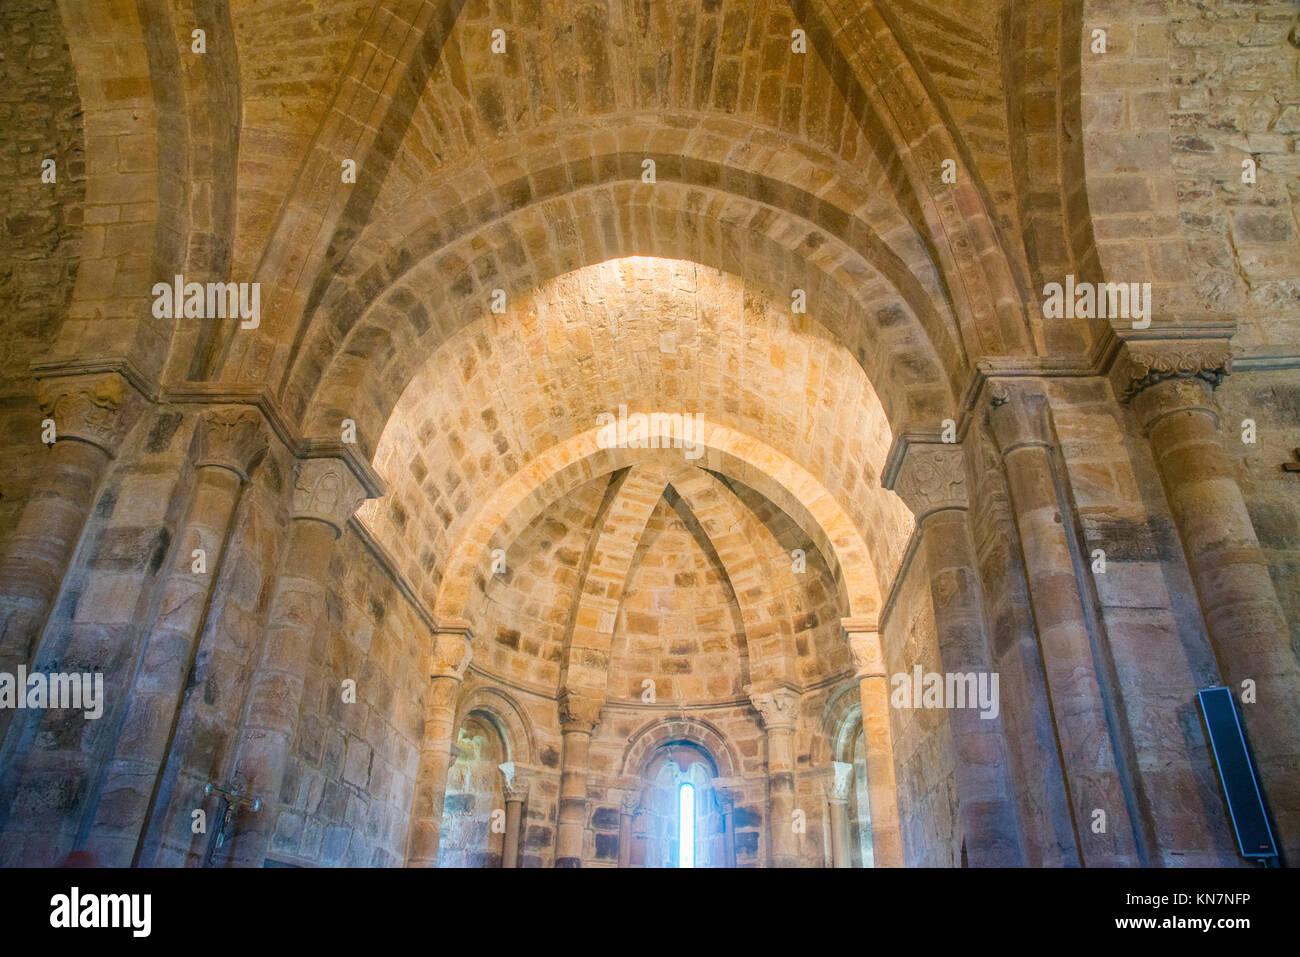 Vault of the Romanesque church. San Salvador de Cantamuda, Palencia province, Castilla Leon, Spain. - Stock Image